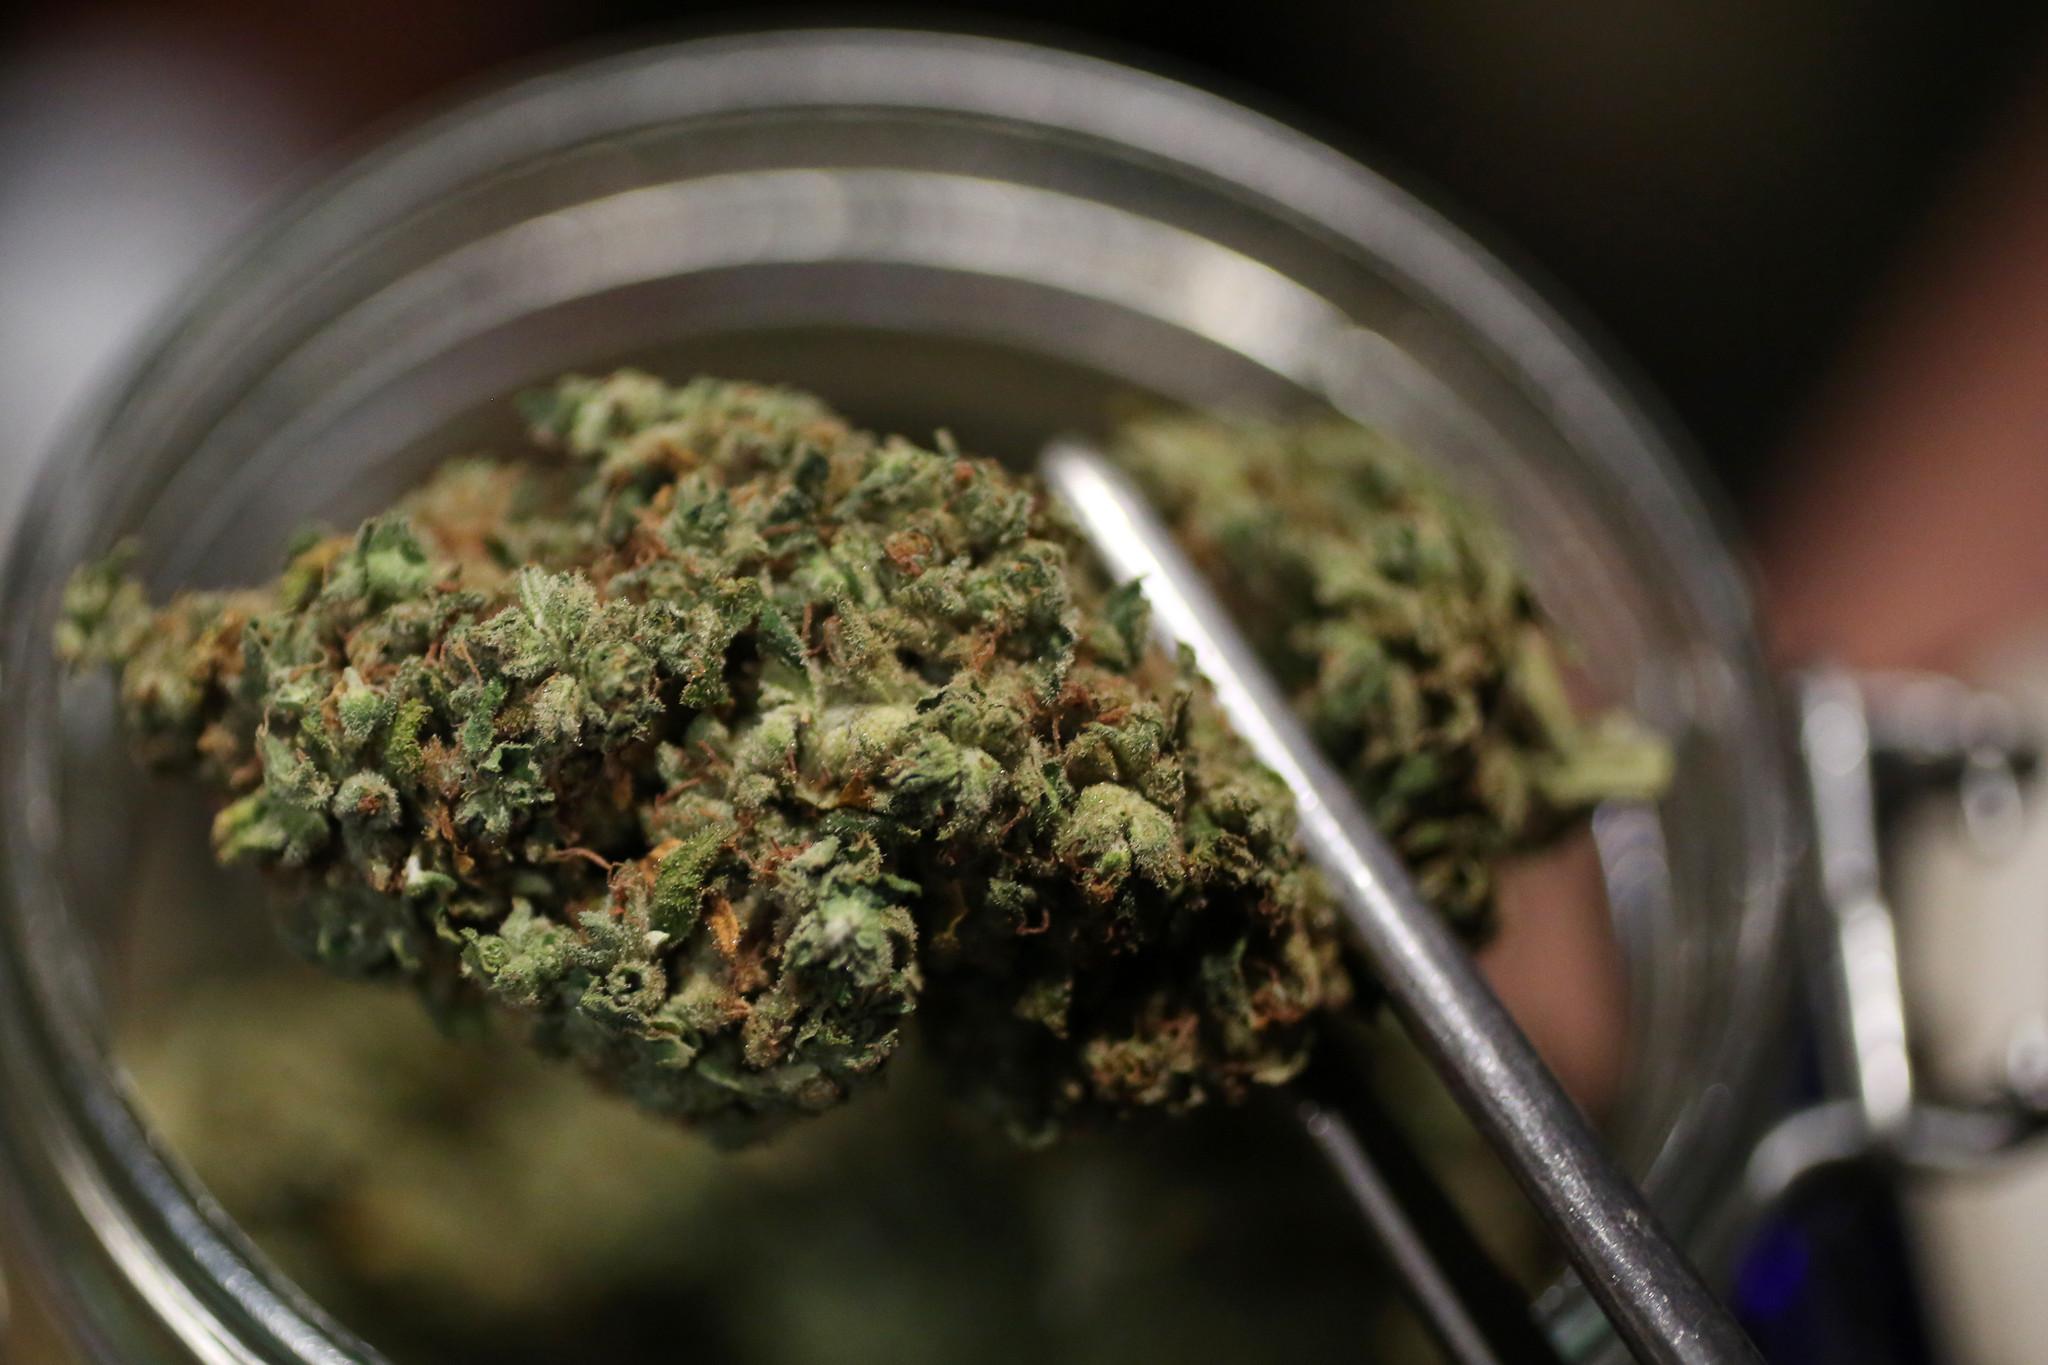 FBI approves Illinois marijuana business background checks